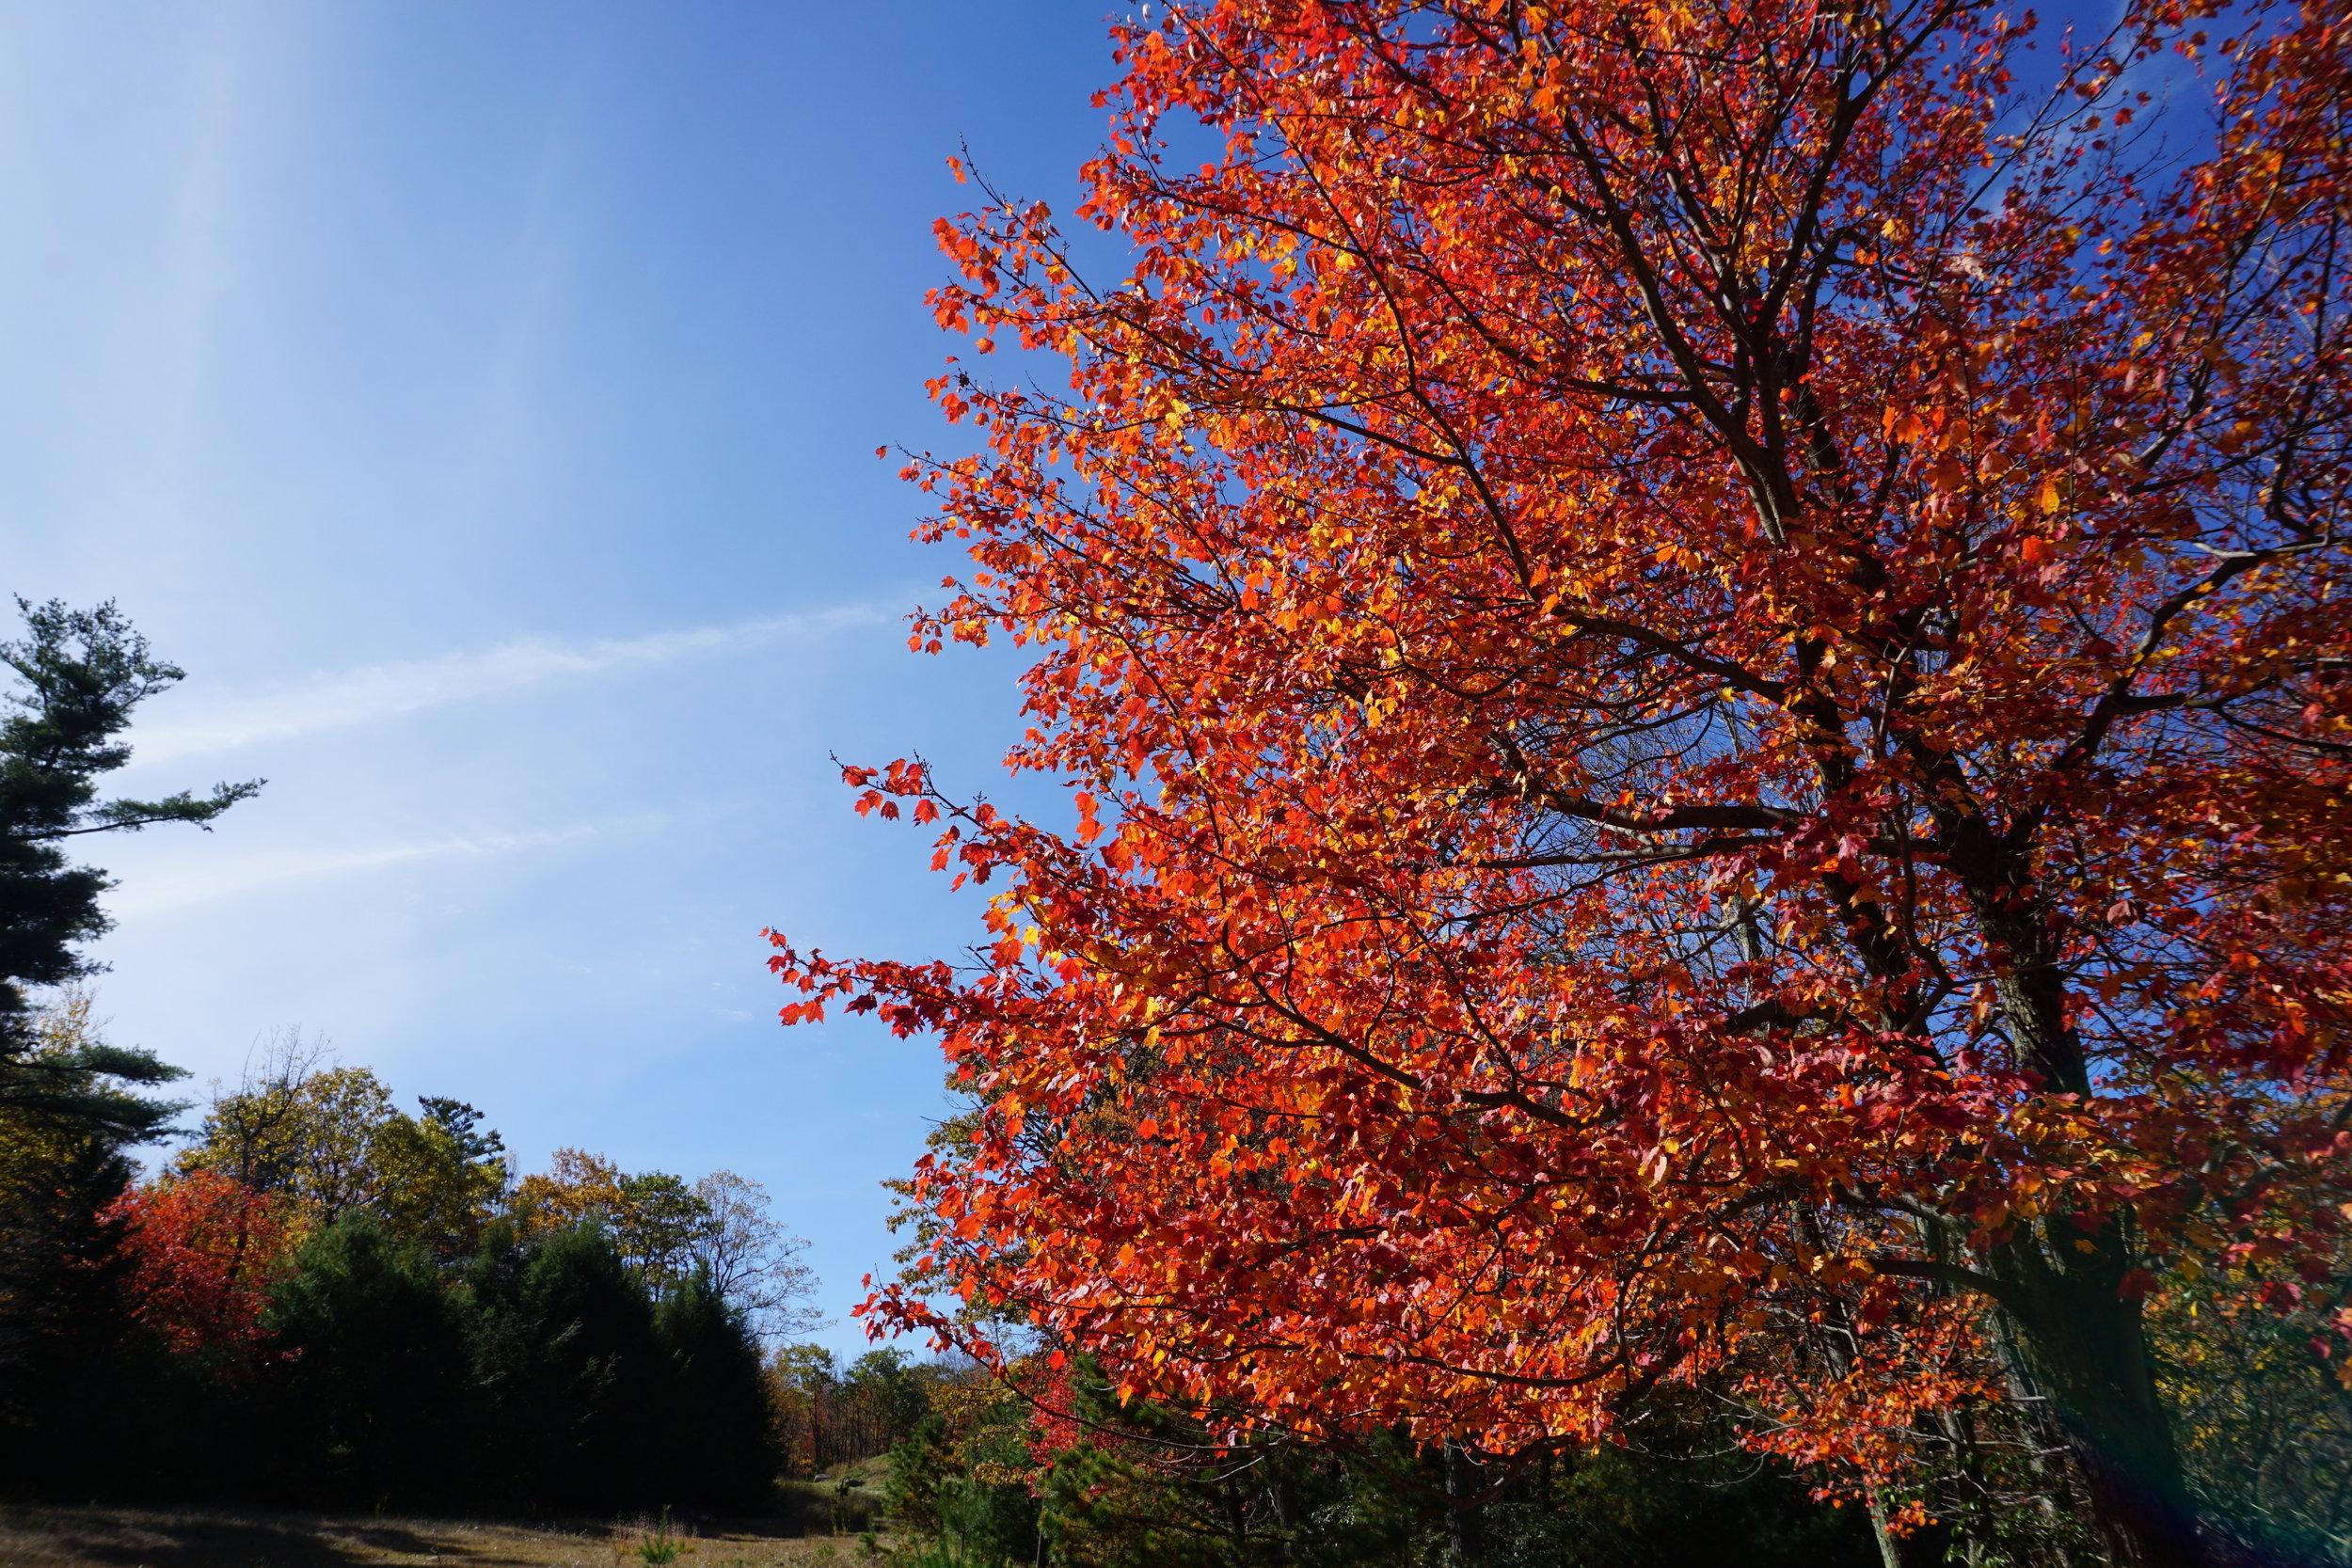 Poconos, PA in autumn